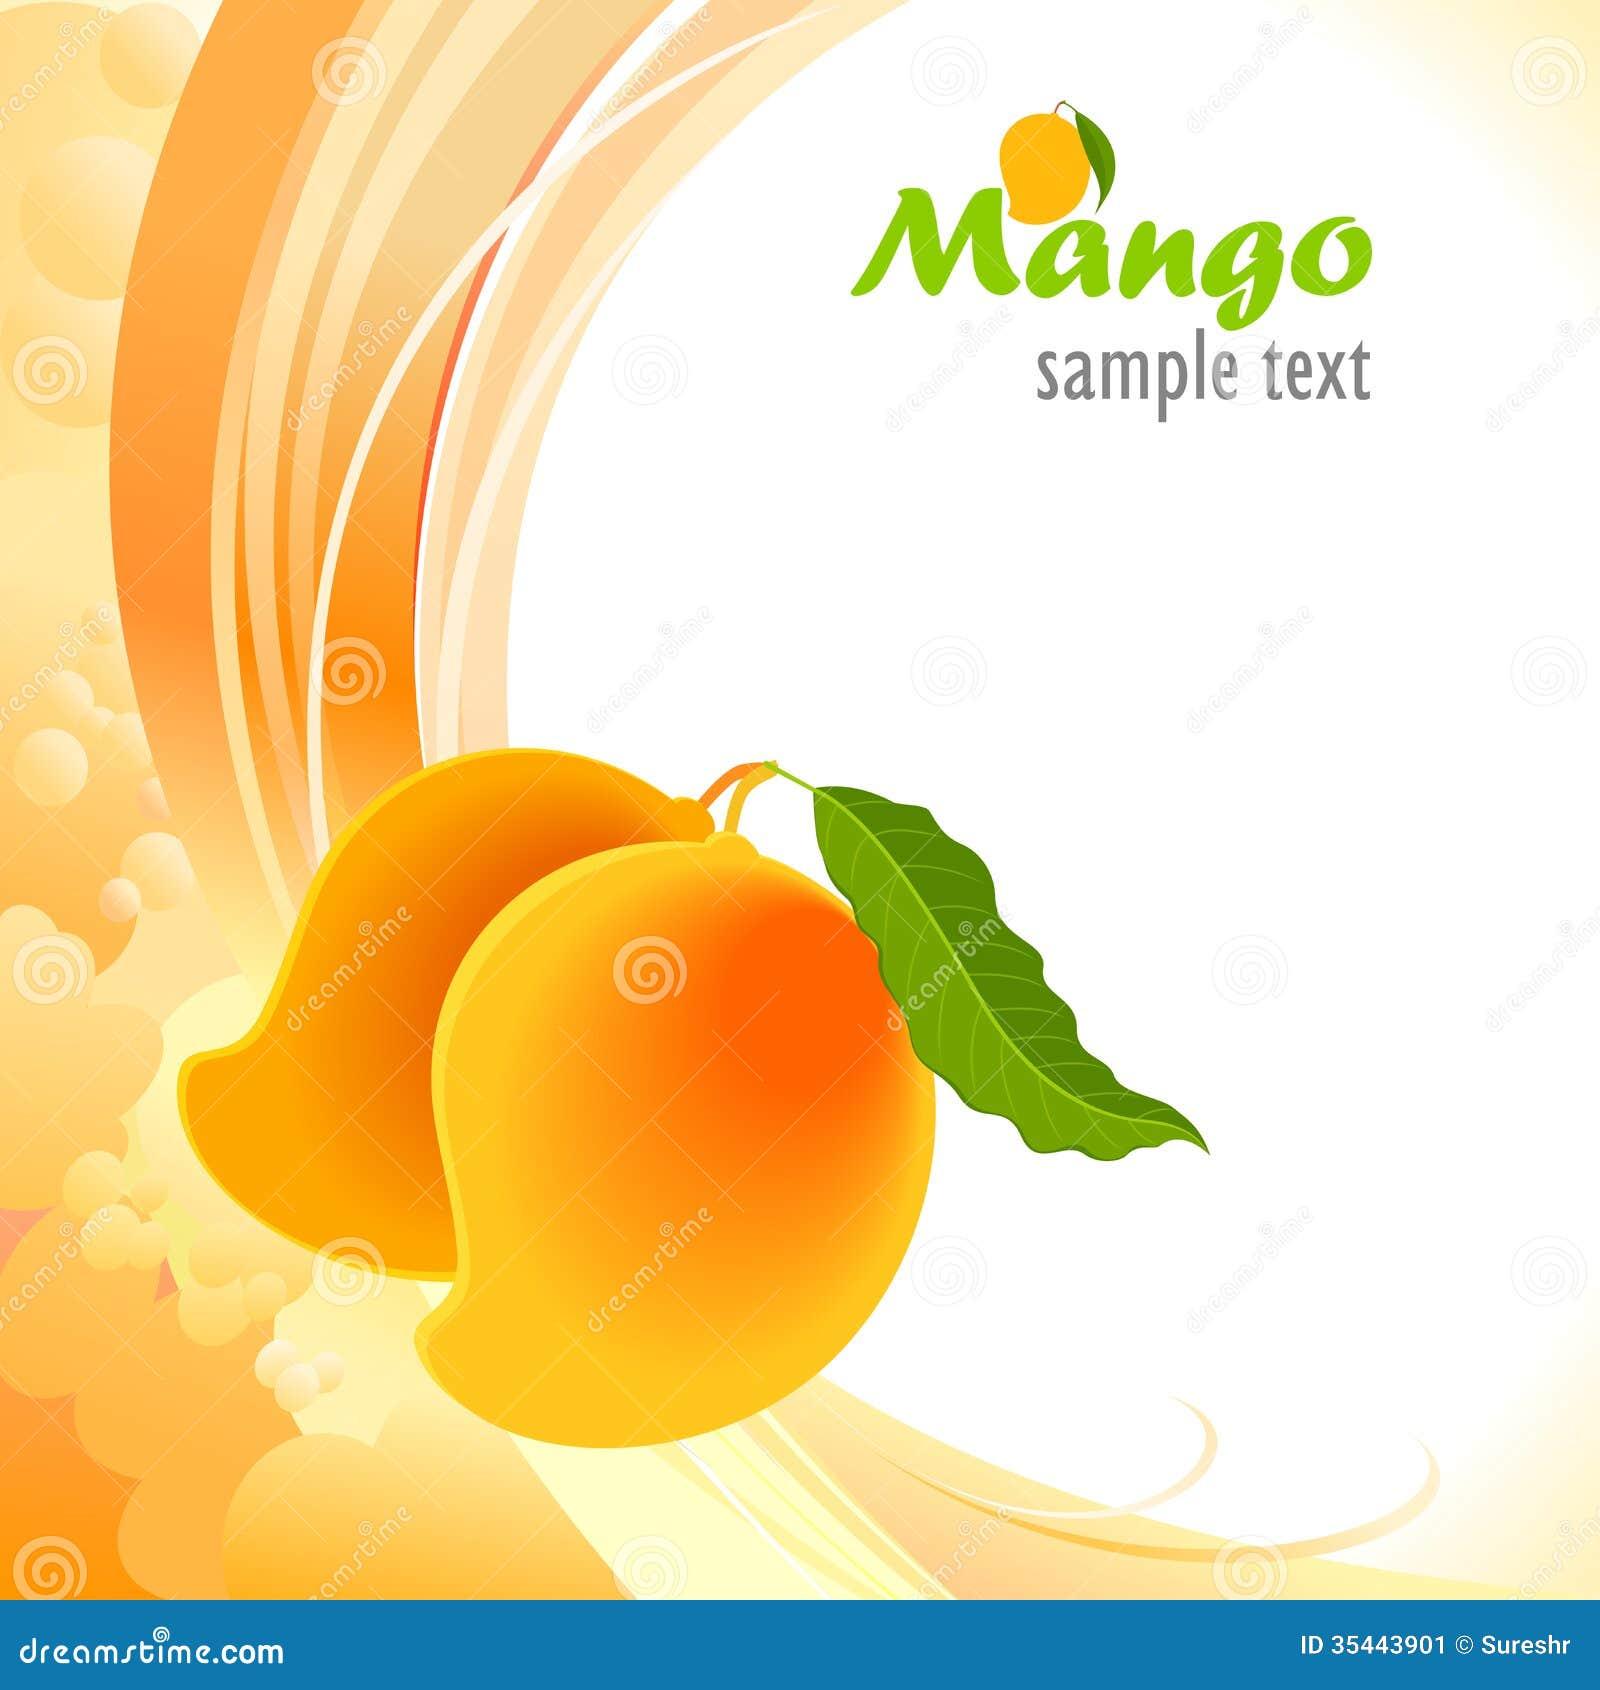 alphonso mango king mangoes try 35443901